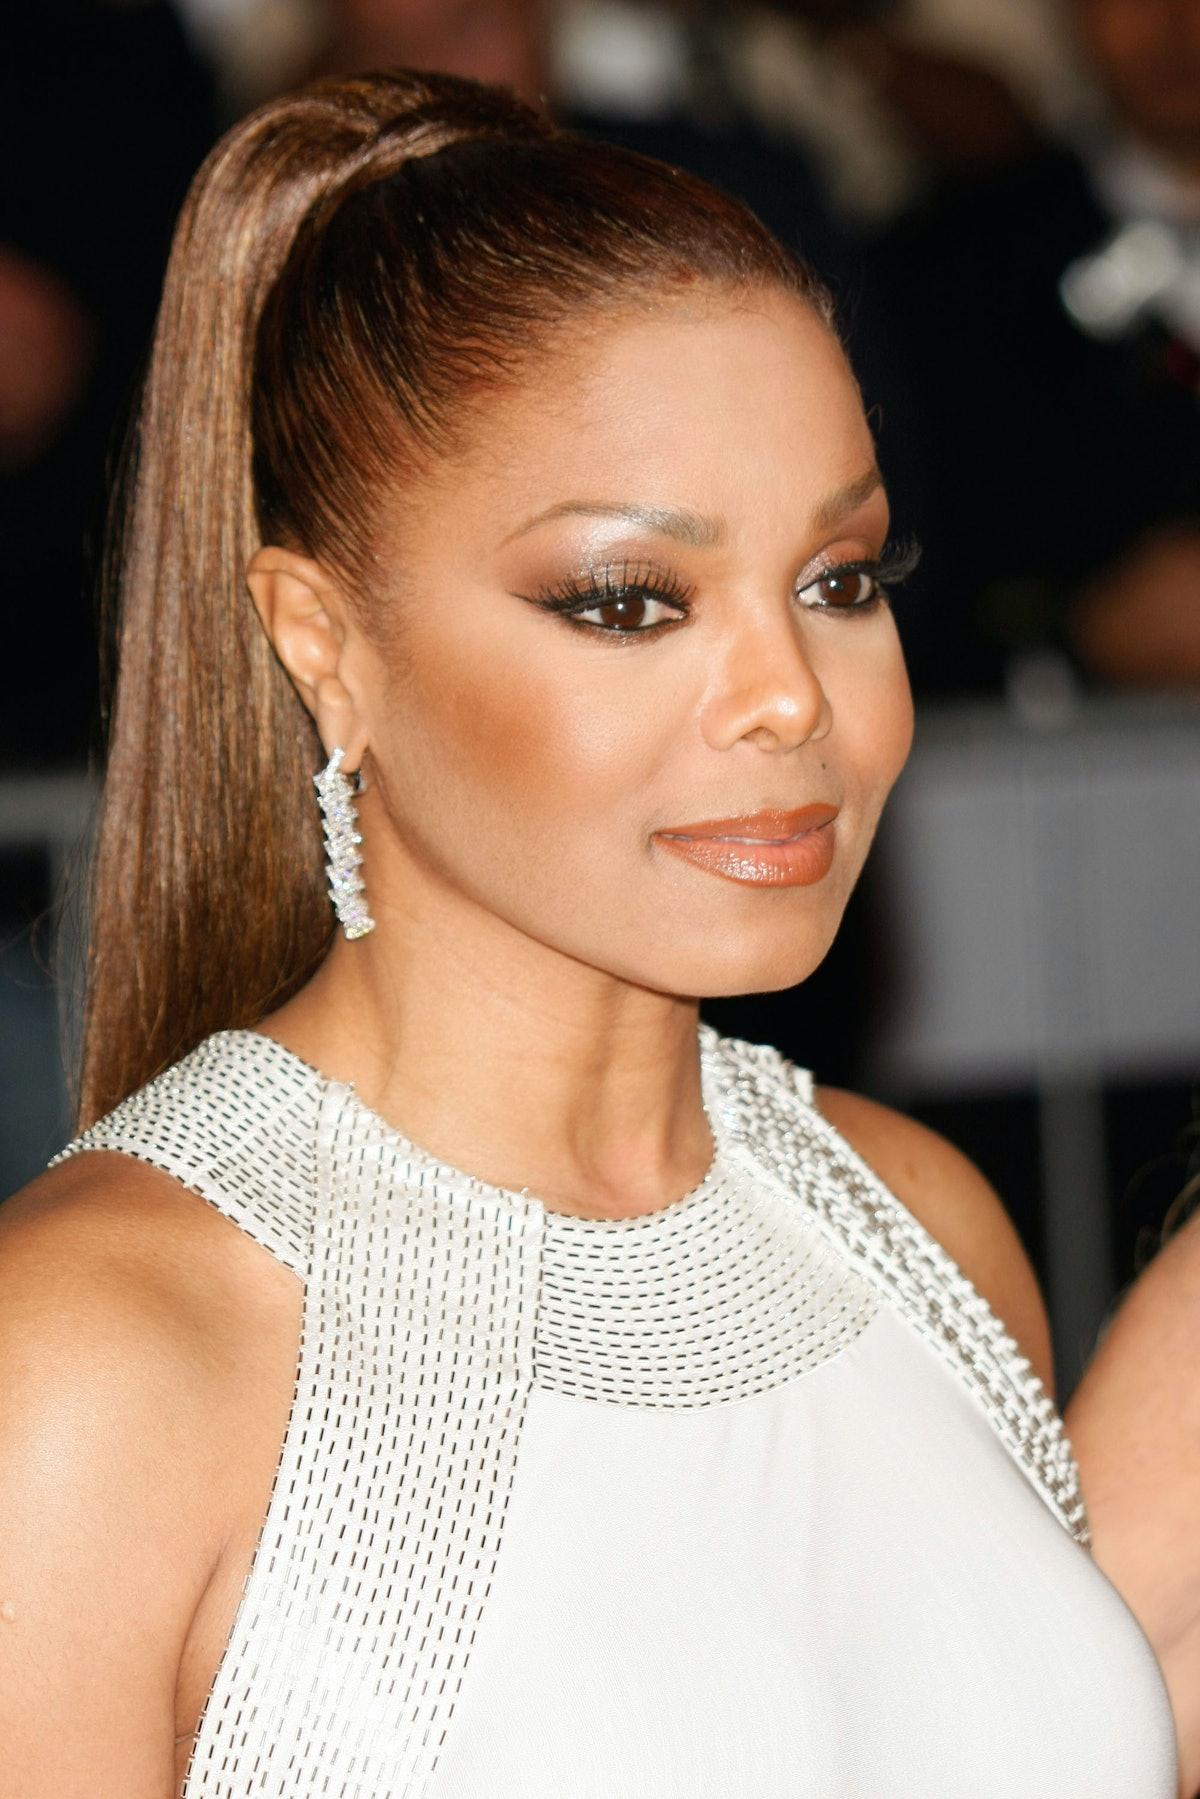 NEW YORK - MAY 5:  Singer Janet Jackson attends the Metropolitan Museum of Art Costume Institute Gal...